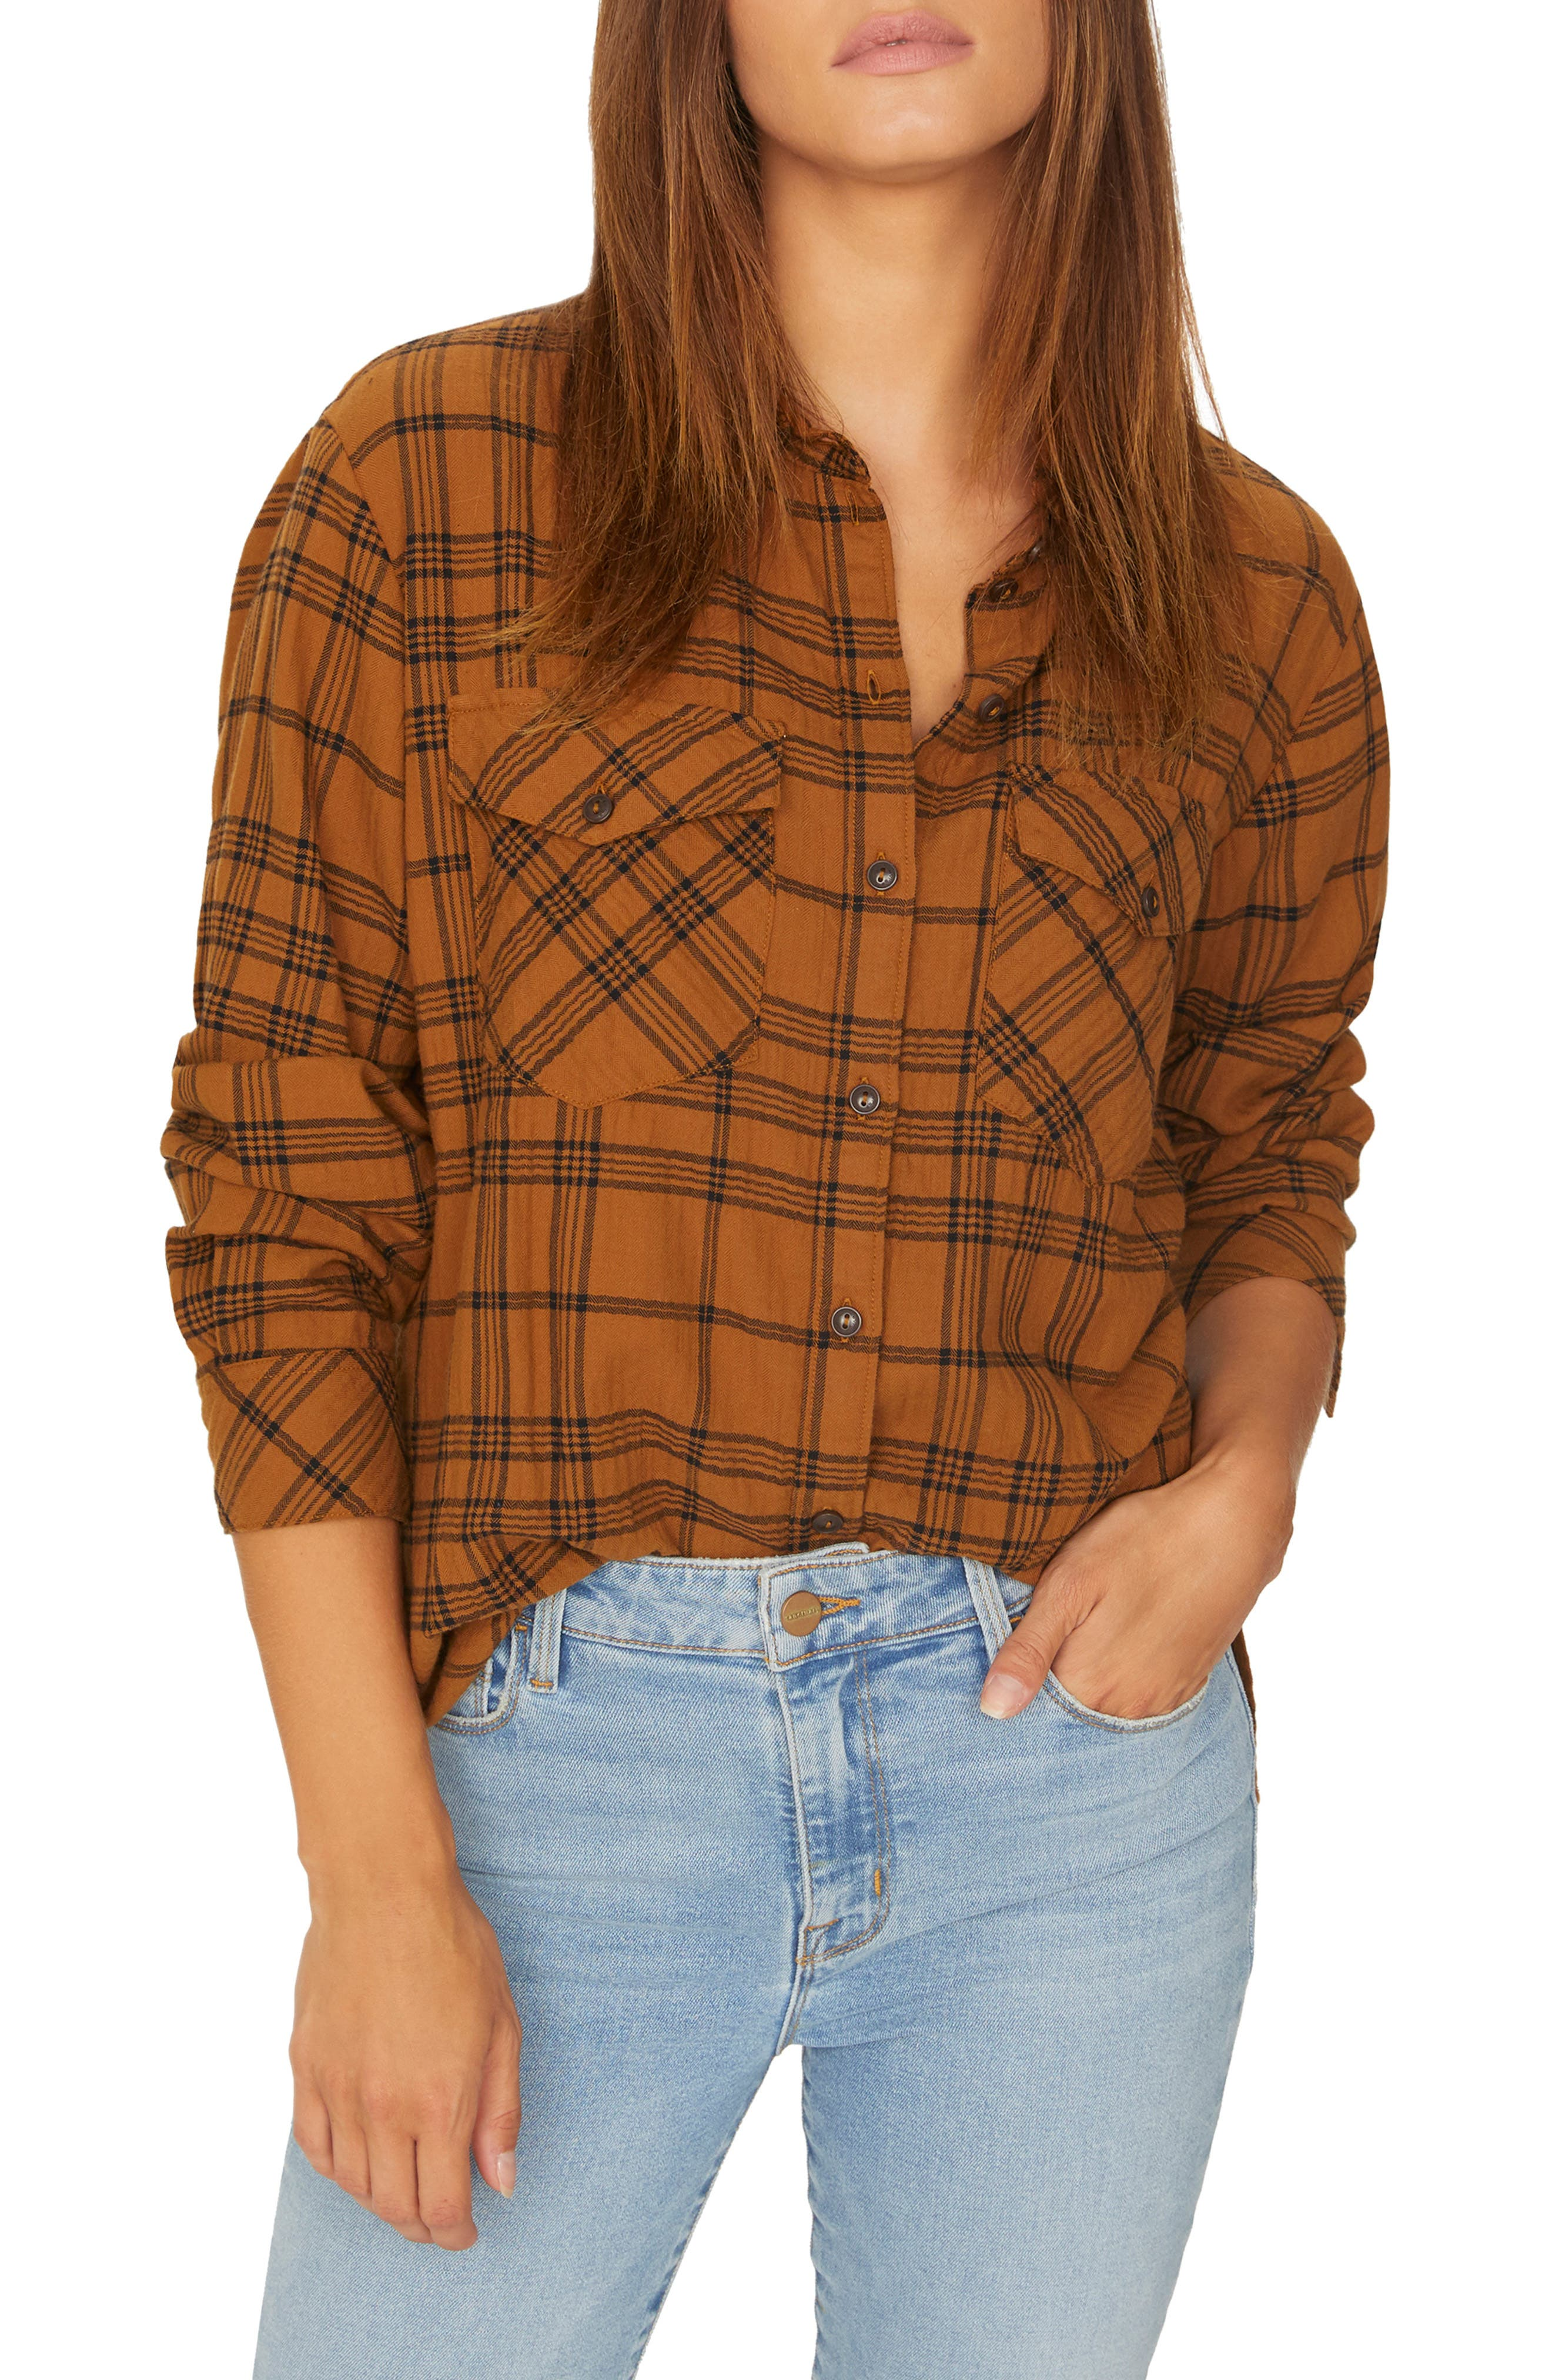 Boyfriend for Life Plaid Shirt,                         Main,                         color, AUTUMN PLAID